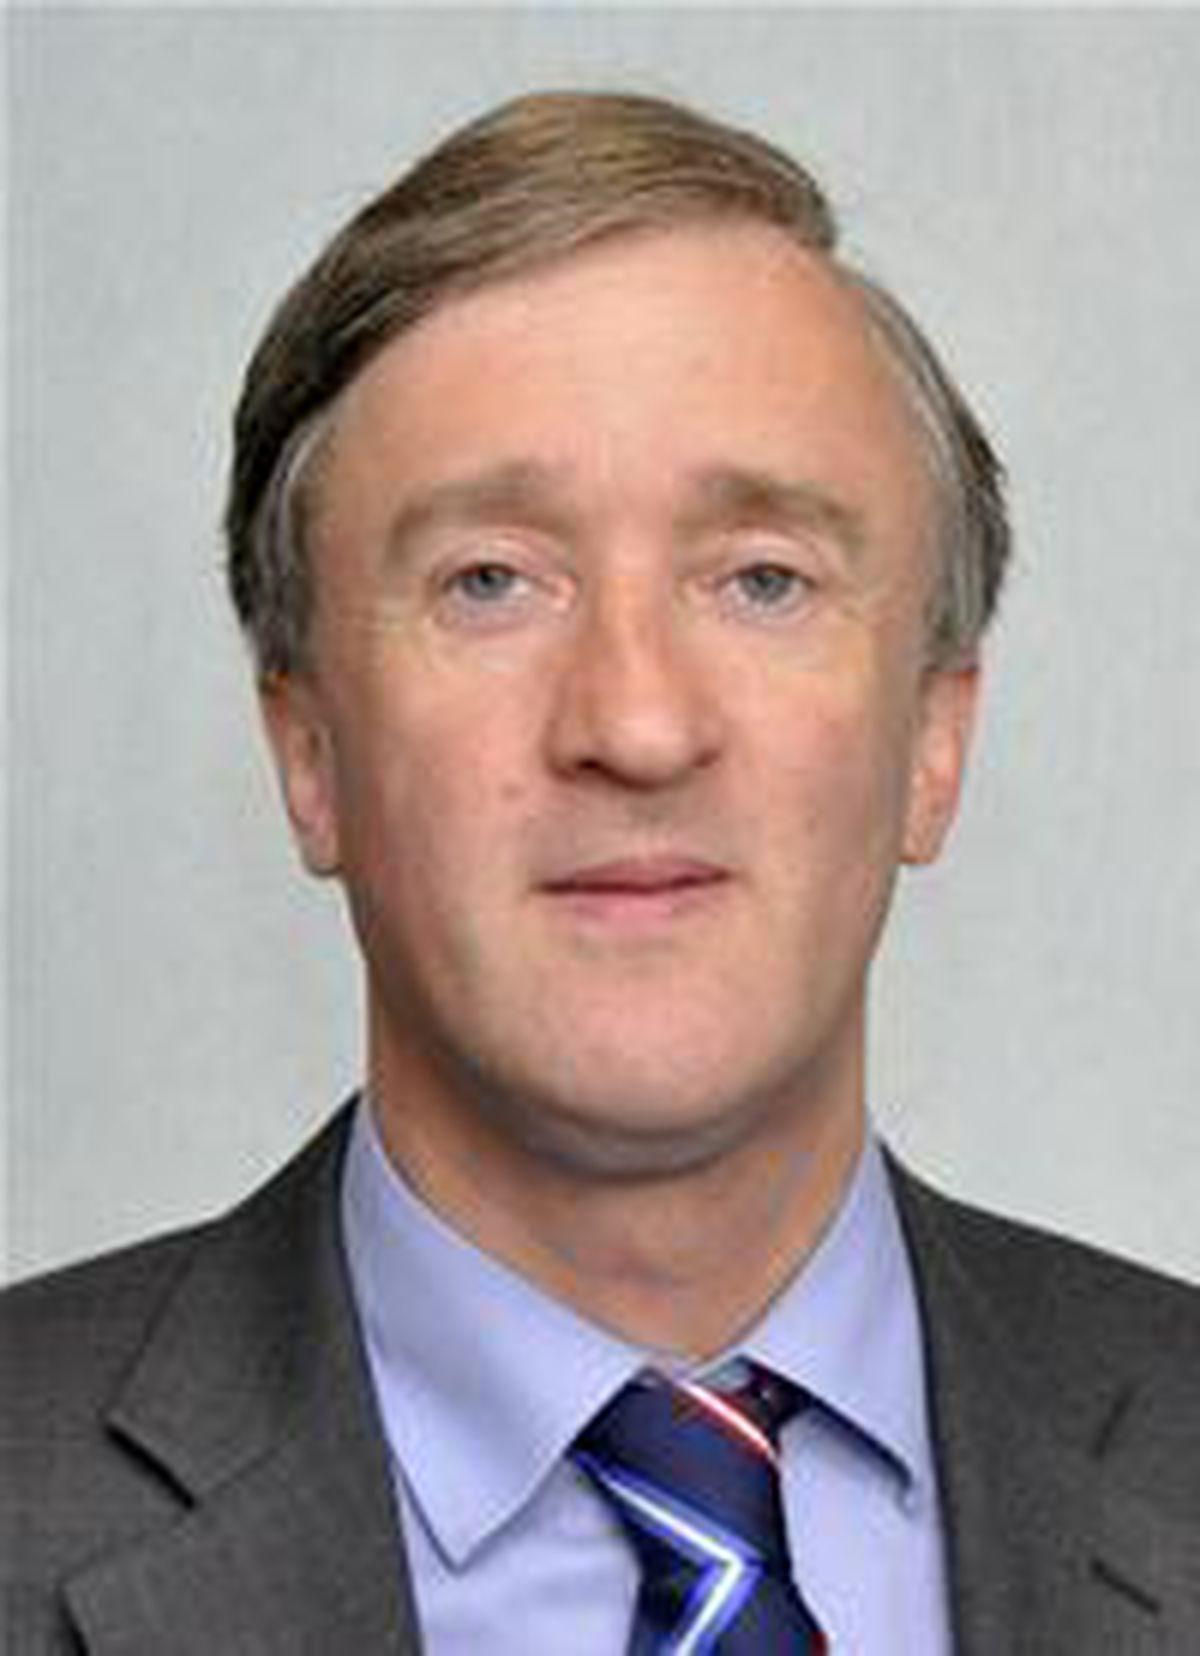 Bridgnorth East & Astley Abbotts Shropshire Councillor Christian Lea